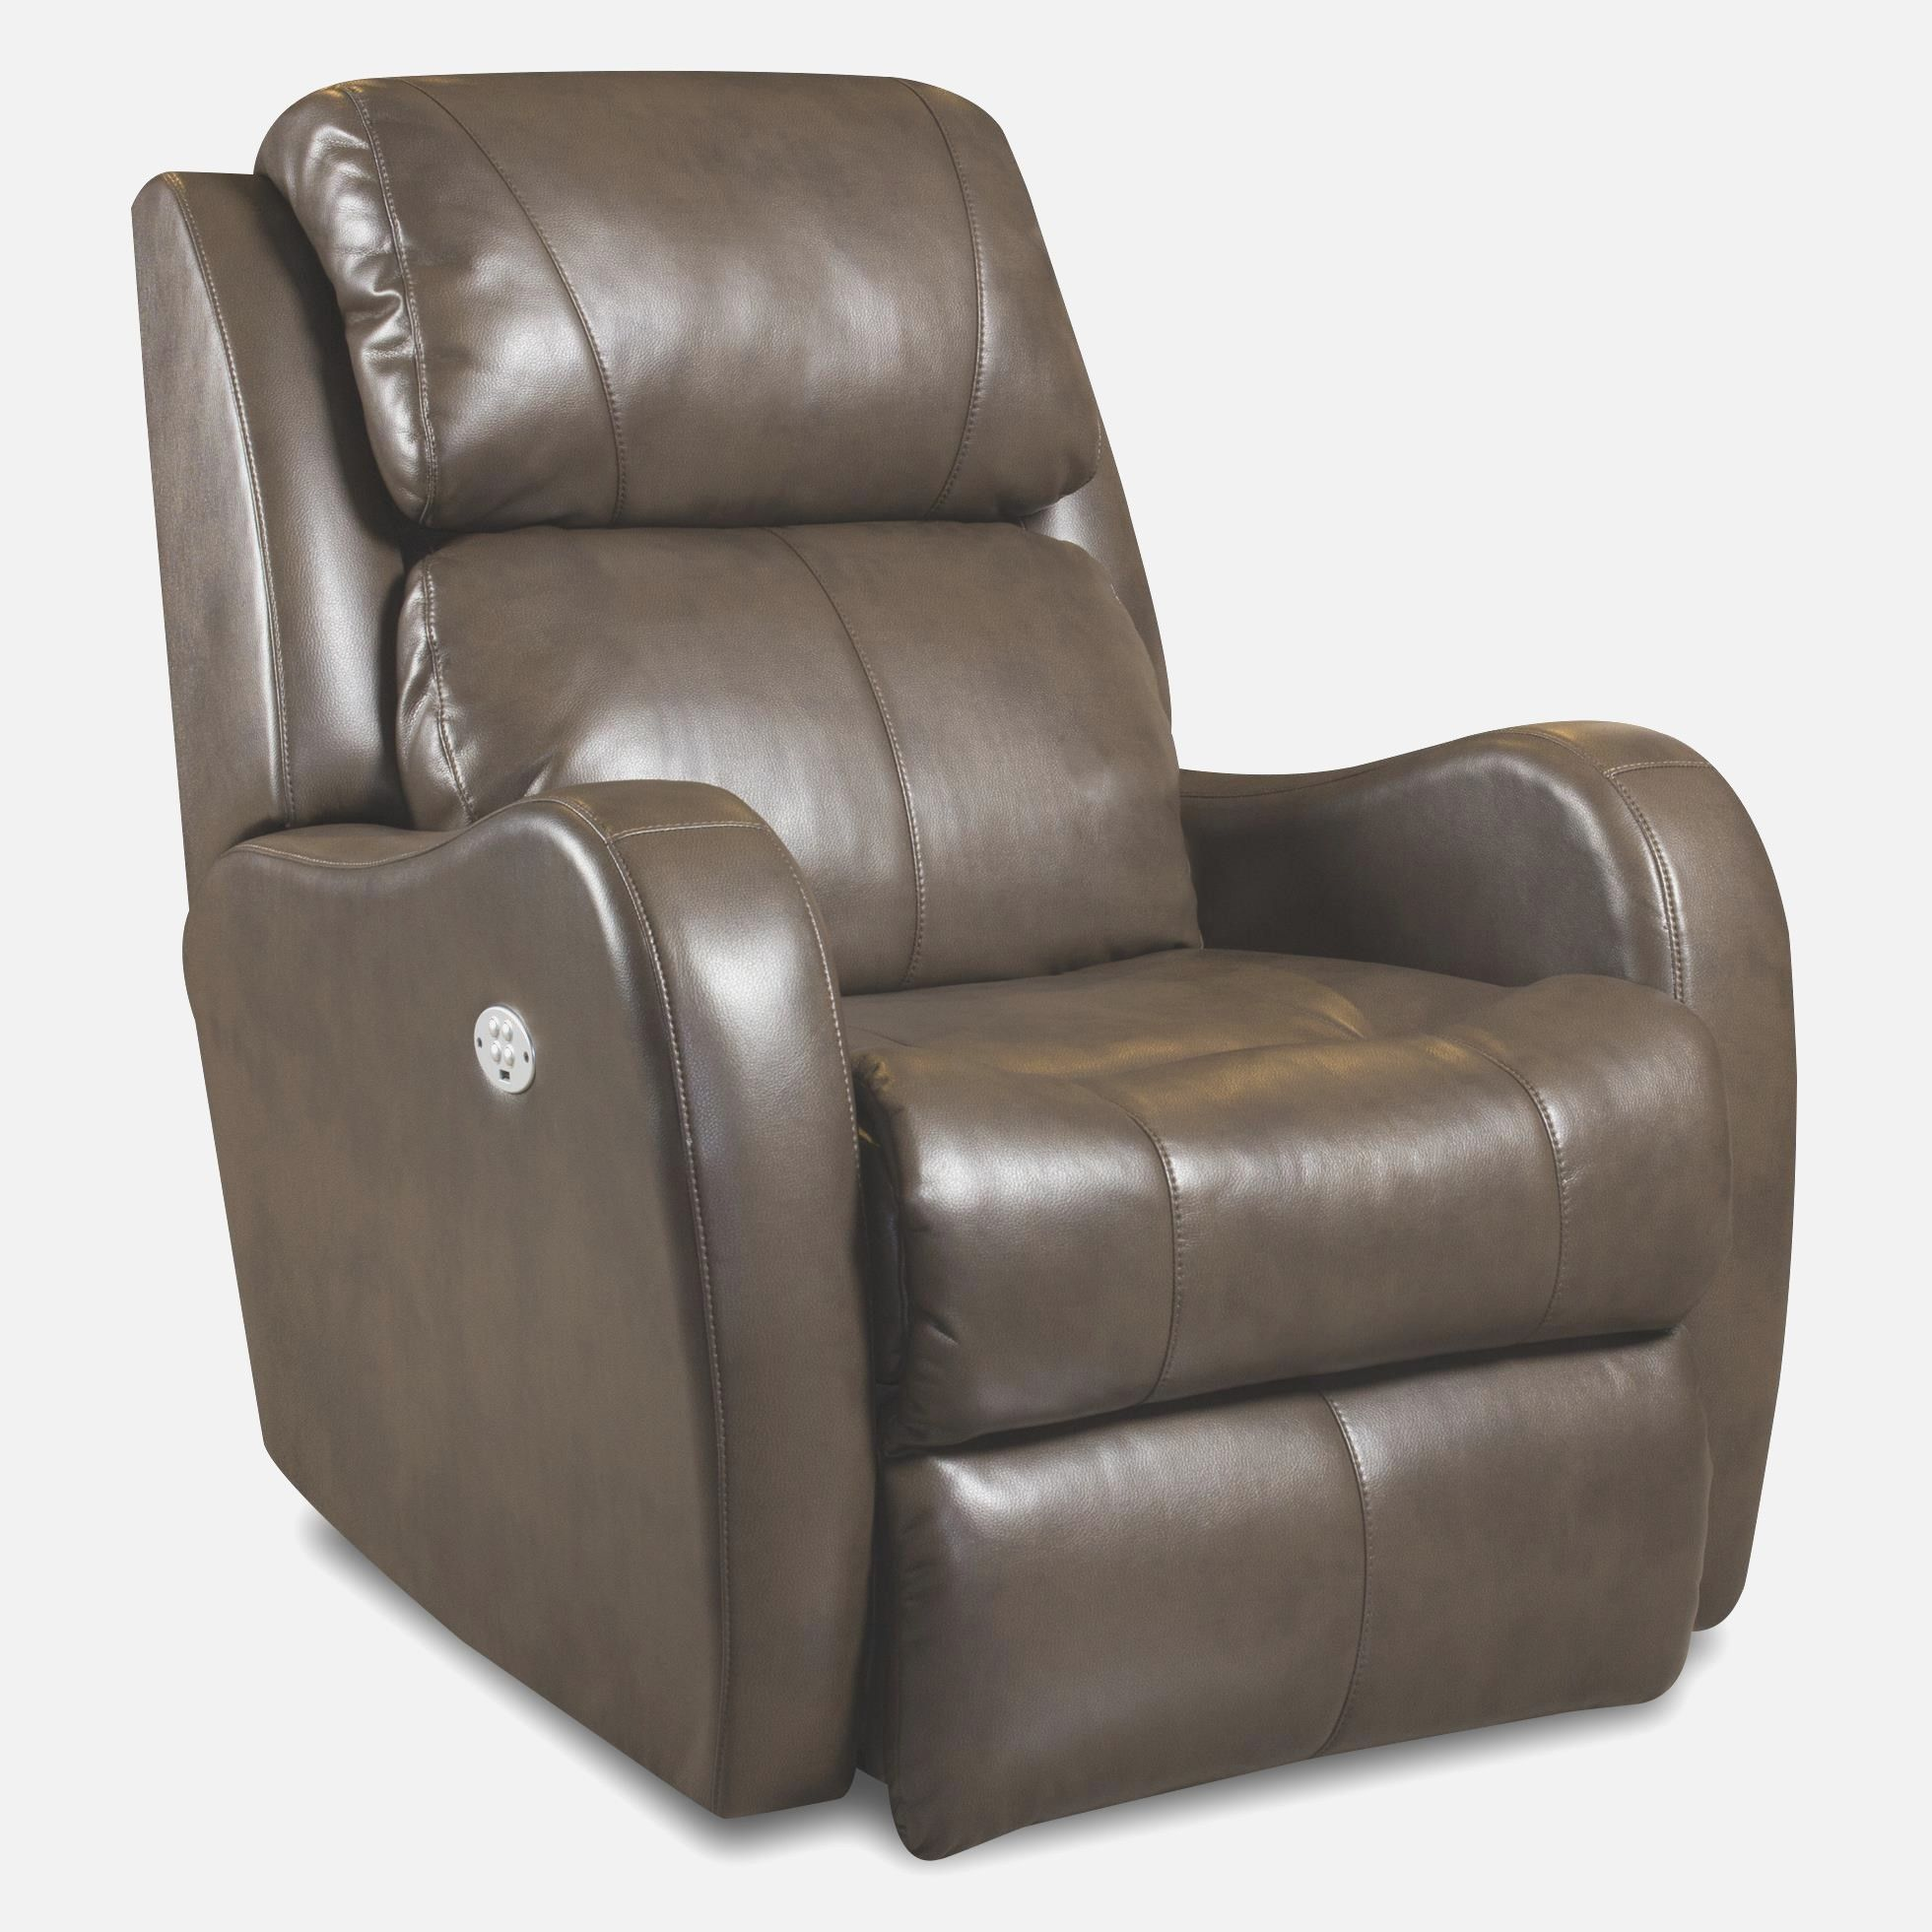 lay flat recliner chairs interactive health massage chair catnapper burns reclining lift power